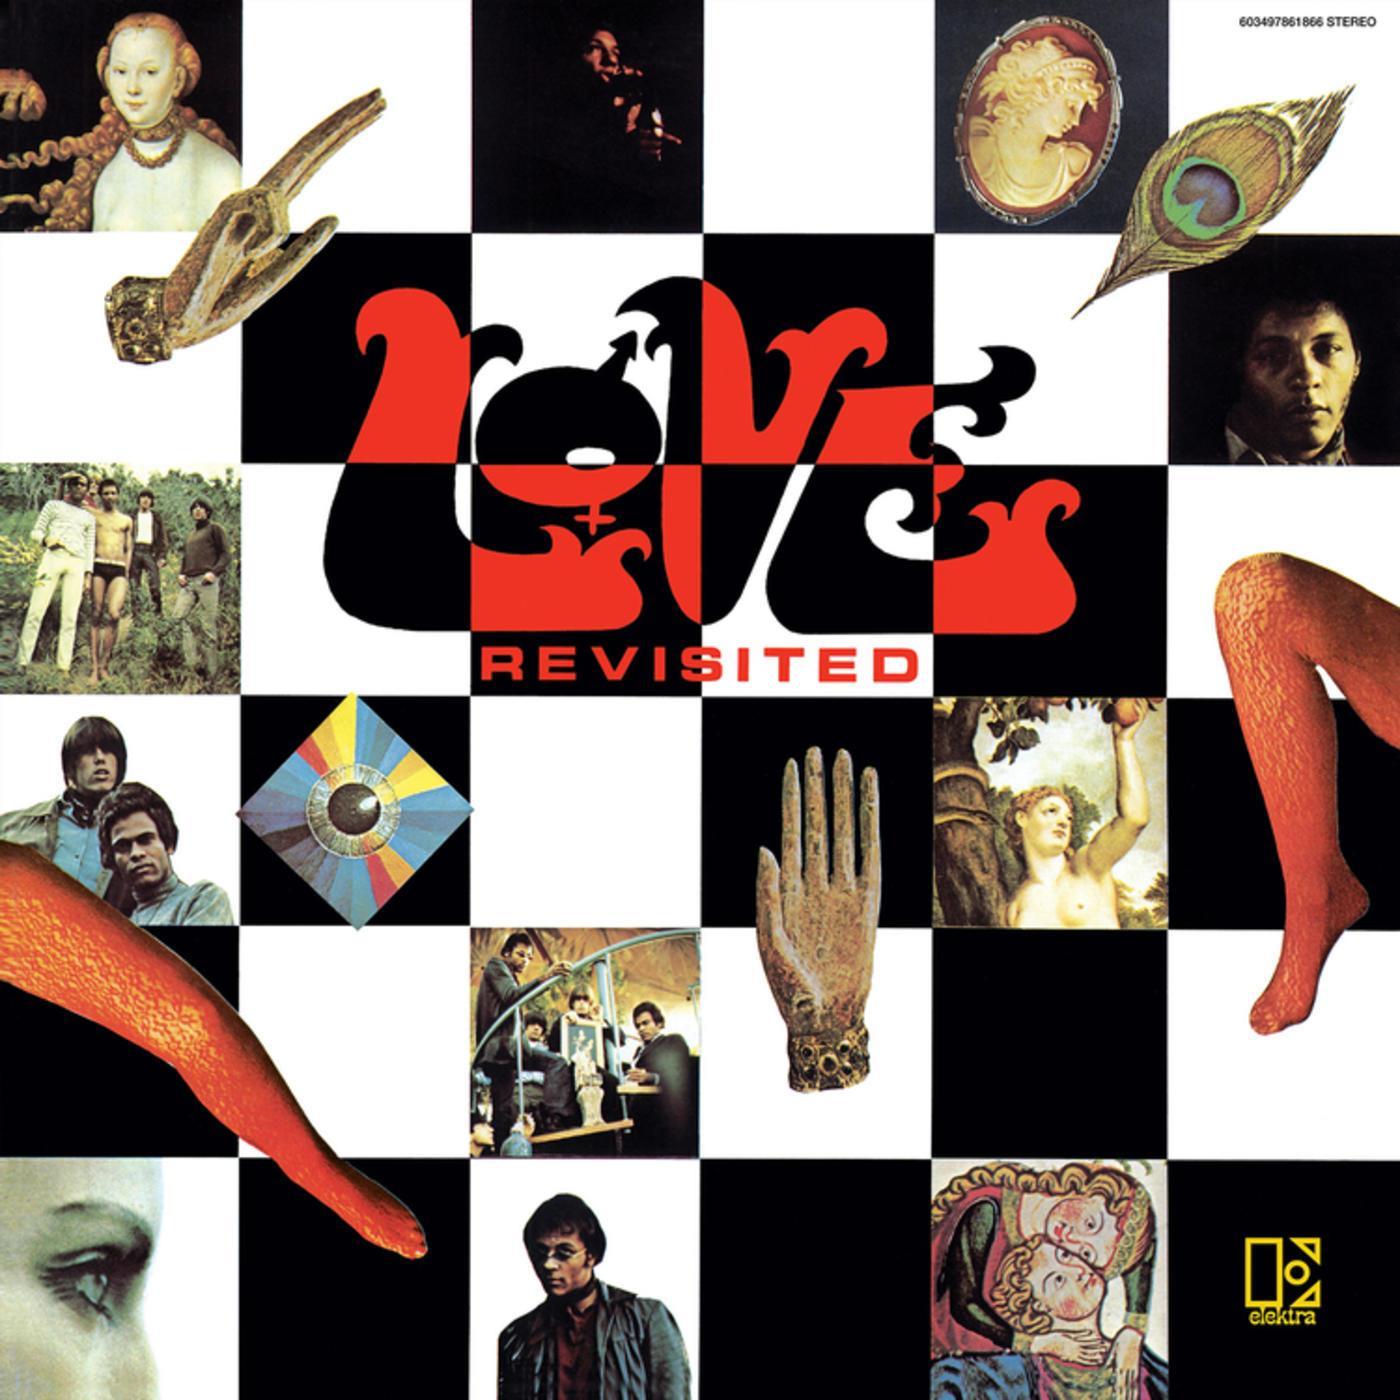 Love - Revisited [LTD LP]